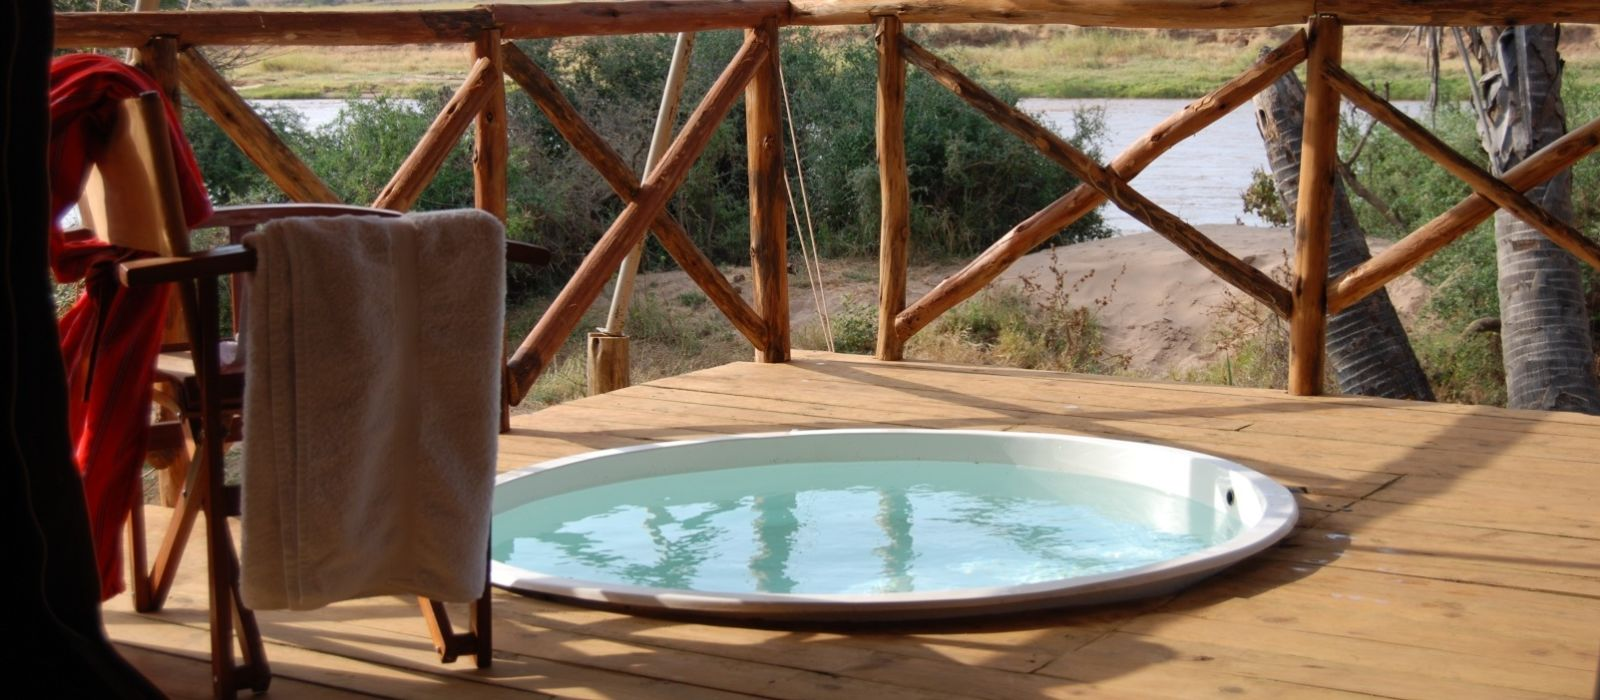 Hotel Elephant Bedroom Camp Kenia